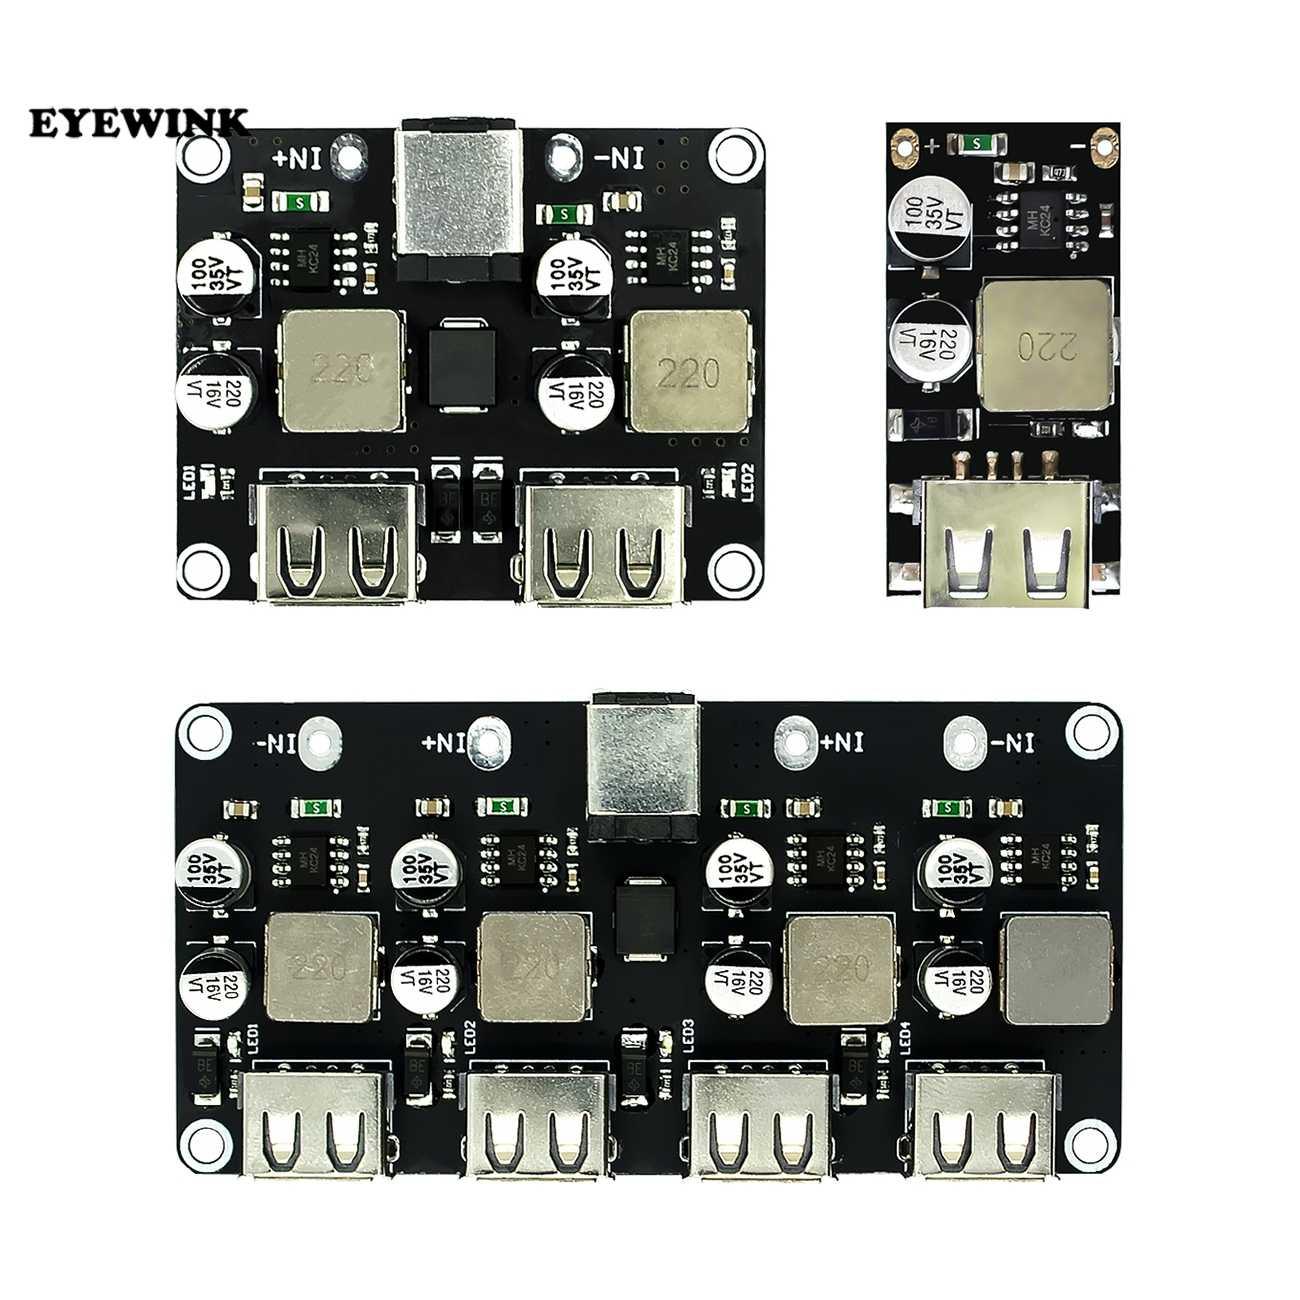 USB QC3.0 QC2.0 USB DC-DC Buck convertisseur charge abaisseur Module 6-32V 9V 12V 24V à chargeur rapide carte 5V